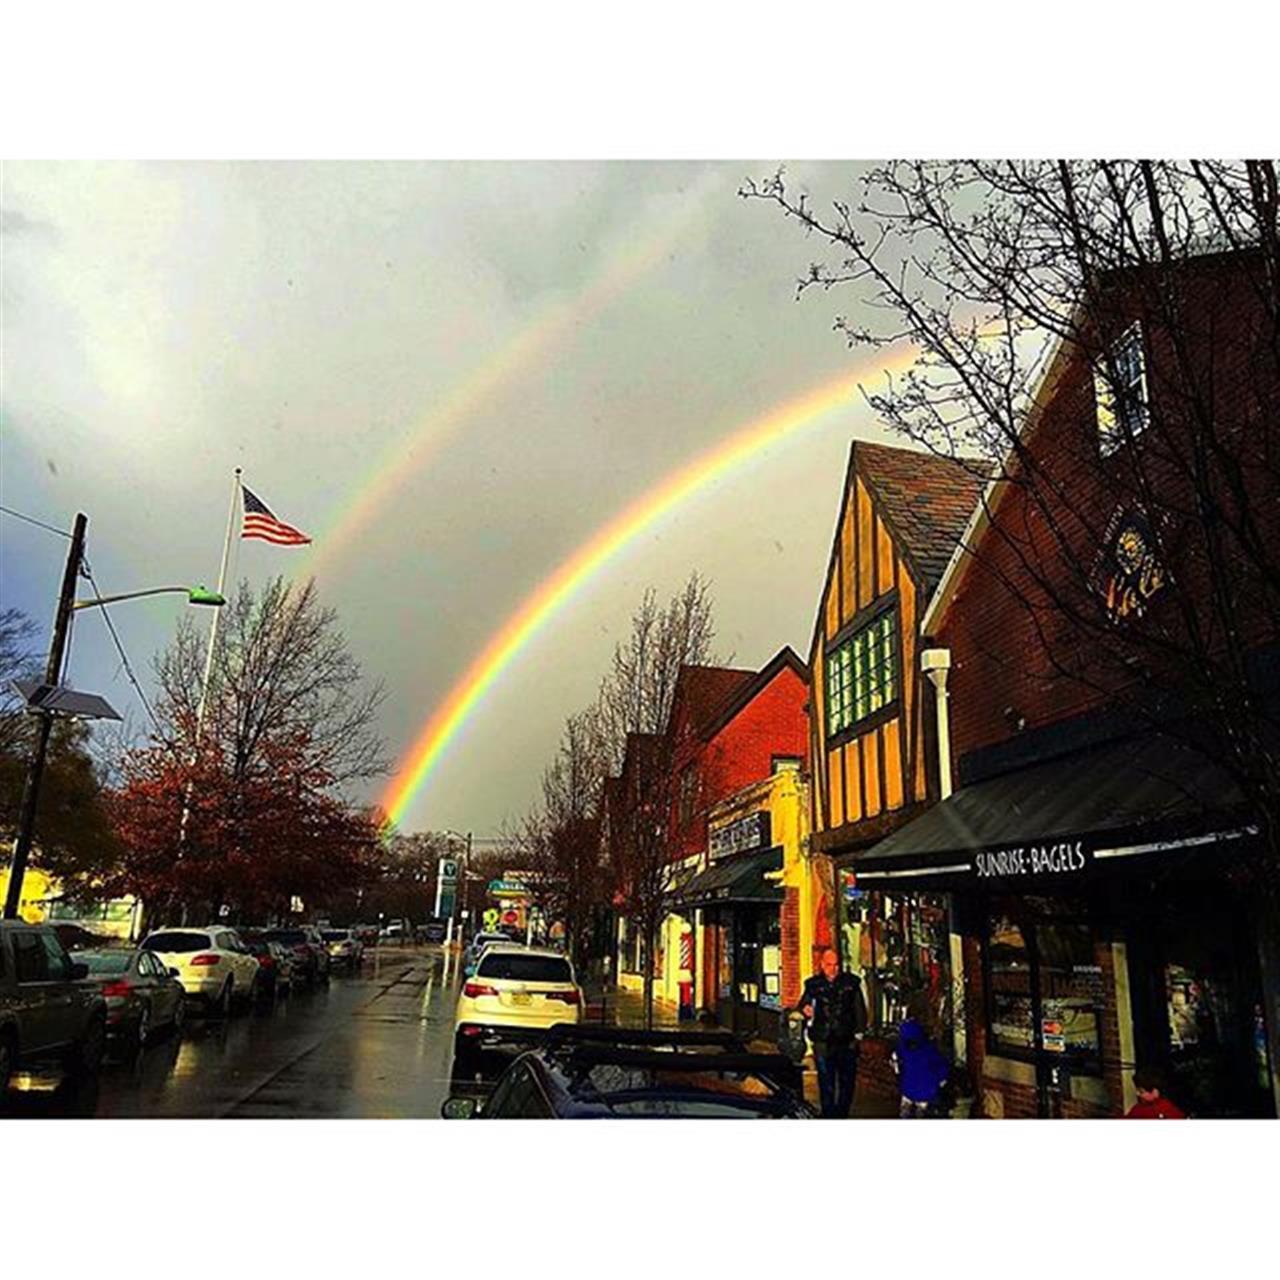 Somewhere over the double rainbow.....Watchung Plaza in Montclair.  #halstead  #exploreyourhood  #montclair #leadingrelocal